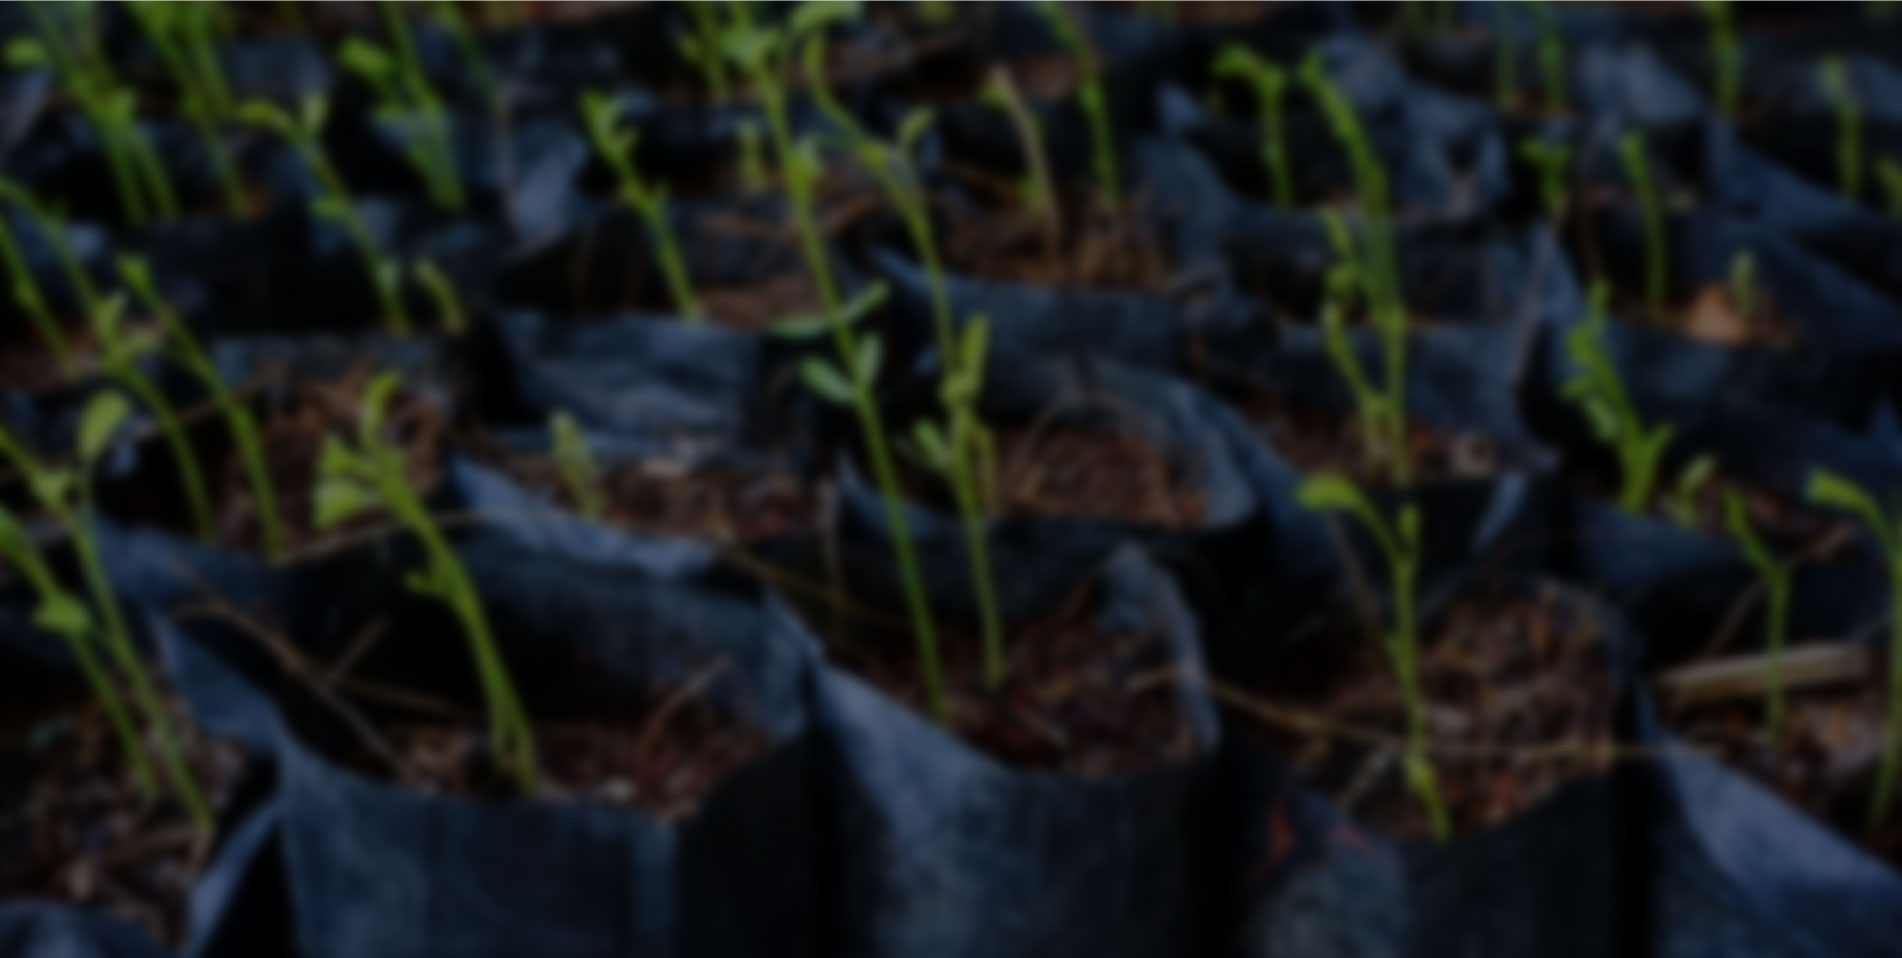 http://34.196.8.203:80/sites/default/files/revslider/image/polytec-agroindustria.jpg